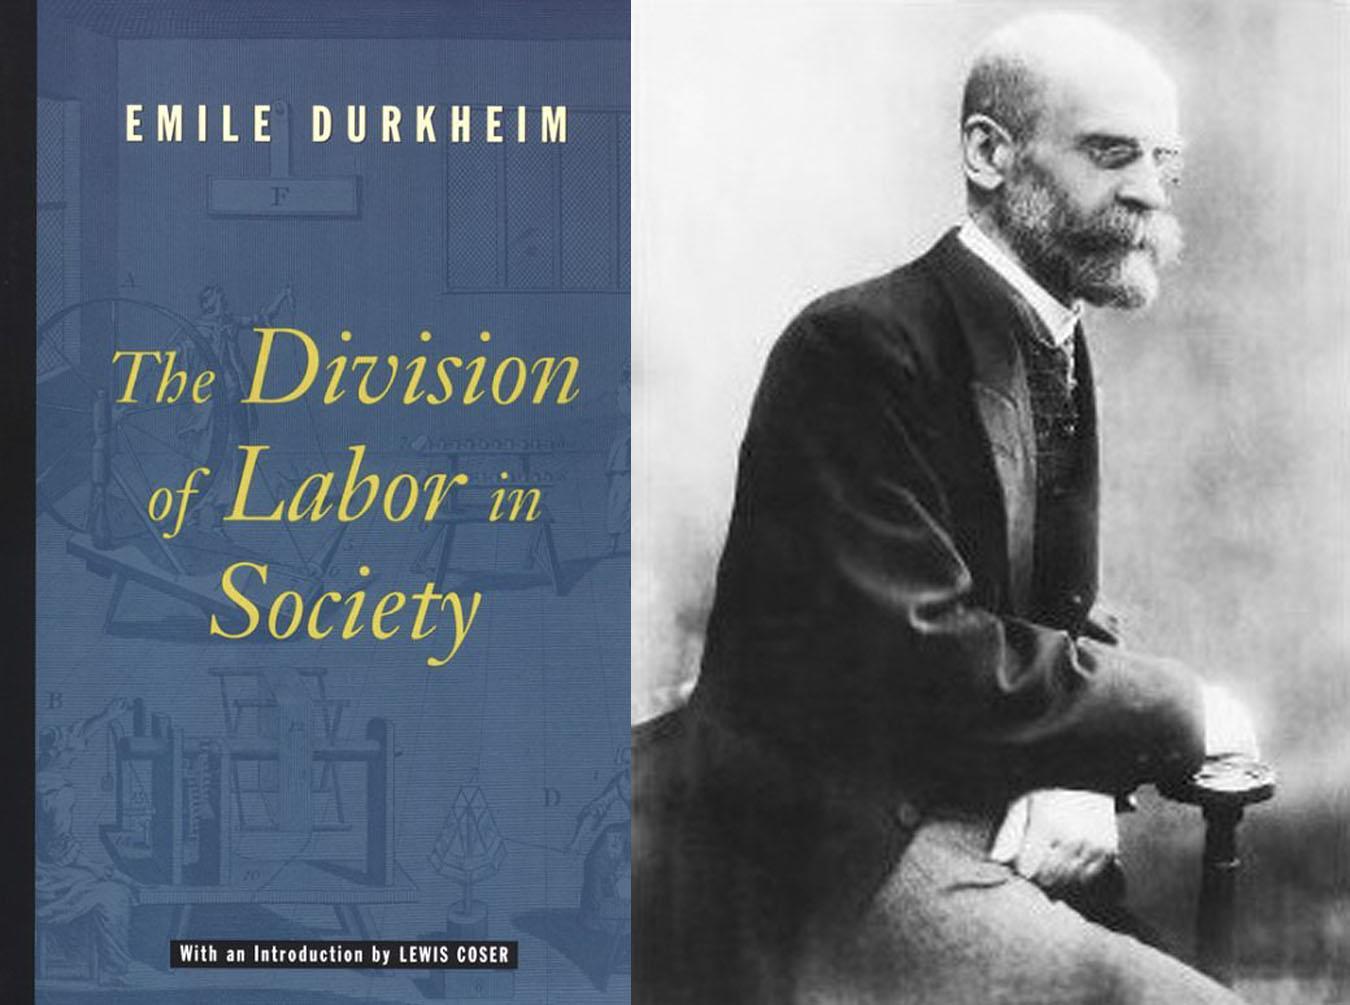 David Émile Durkheim (1858-1917)